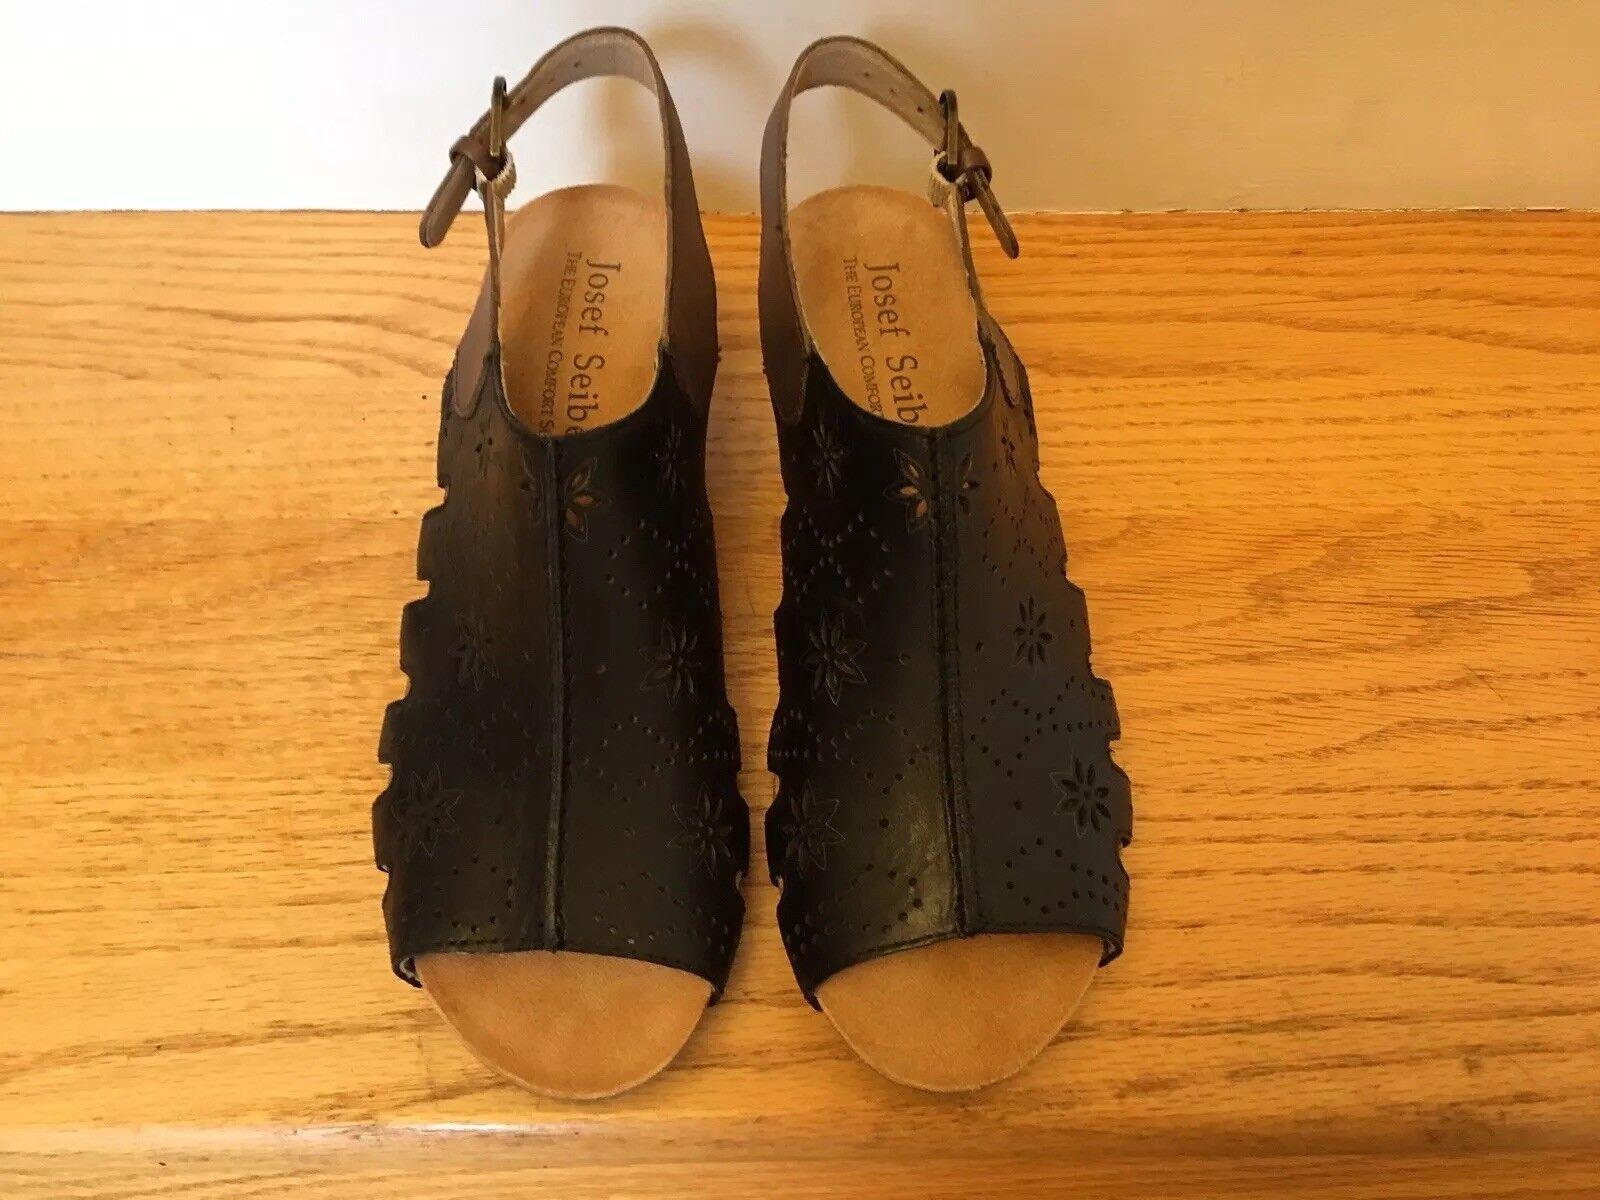 Josef Seibel, Ruth 01 Sandals Black Black Black Leather Size 37M, 6M - 6.5M New without Box a0ef15